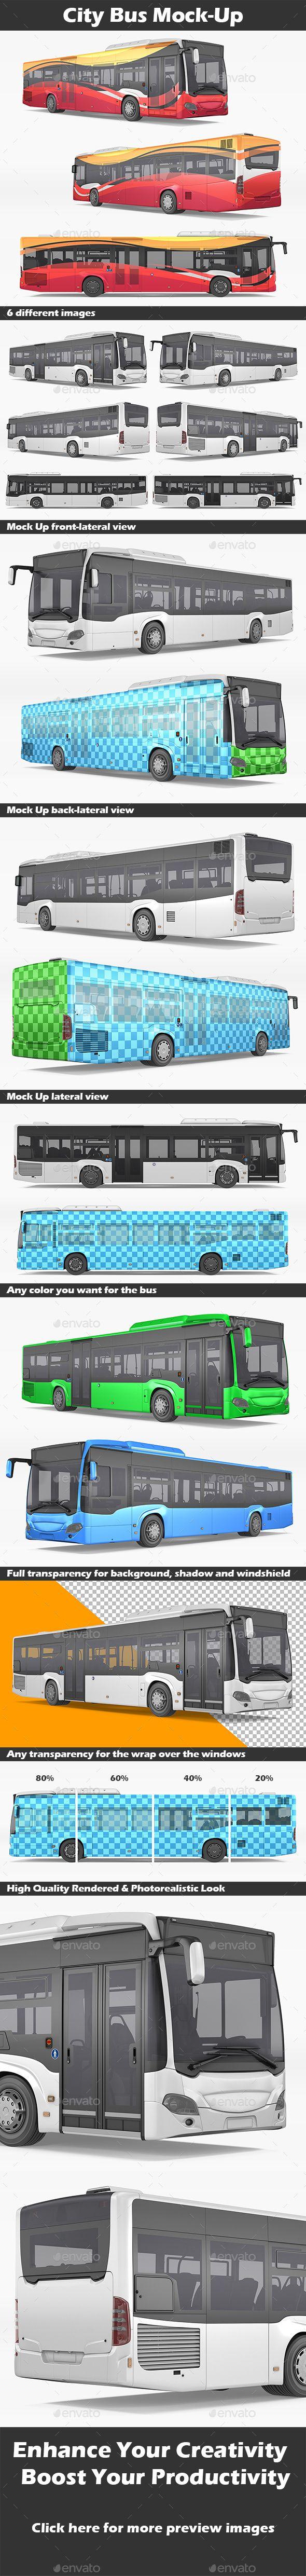 City Bus Mock-Up. Professional fully editable vehicle wrap mockup. #design #identity #mockup #ProductDesign #CarDesign #autobus #automobile #banners #bus #BusMock-up #BusStation #car #CityBus #clean #corporate #graphic #HeavyVehicles #motorbus #omnibus #passengers #PrintMedia #PrintPresent #station #tours #transport #transportation #travel #VisualIdentity #voyage